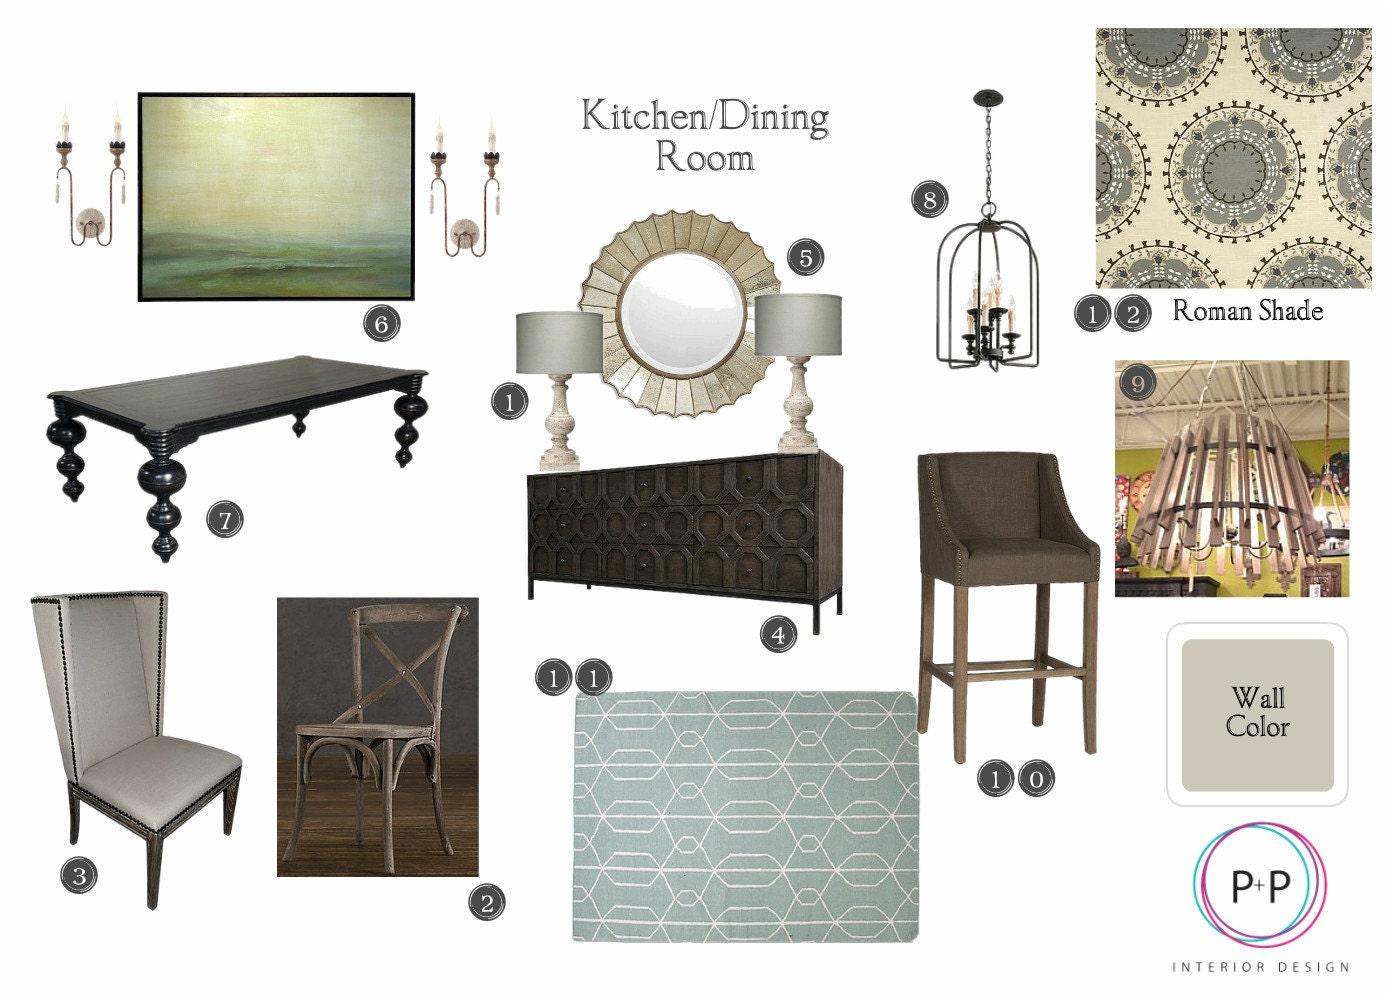 Interior design service customized affordable virtual etsy - Affordable interior design services ...